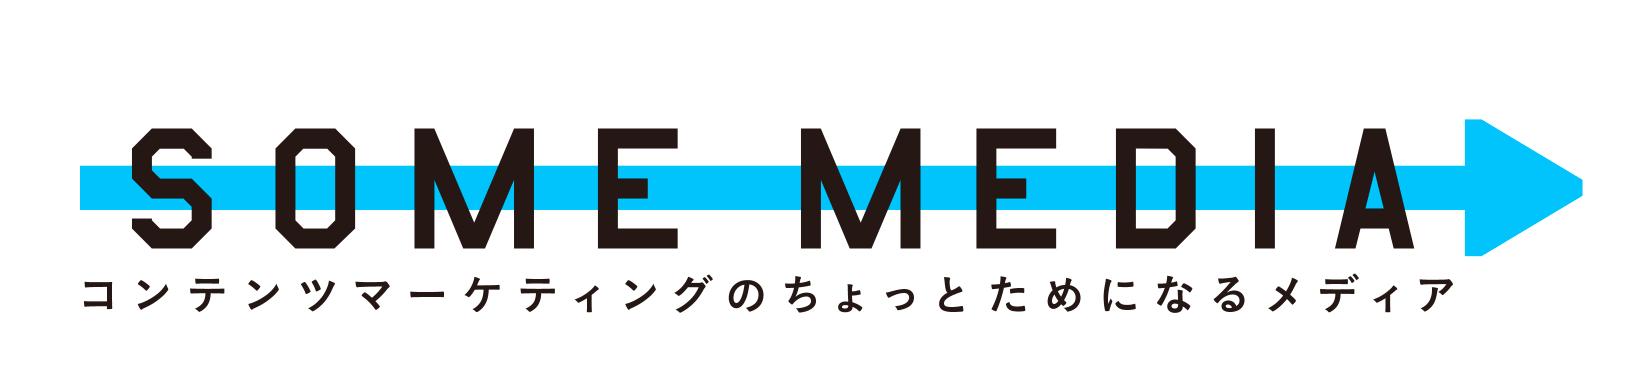 SOME MEDIA~コンテンツマーケティングのちょっとためになるメディア~